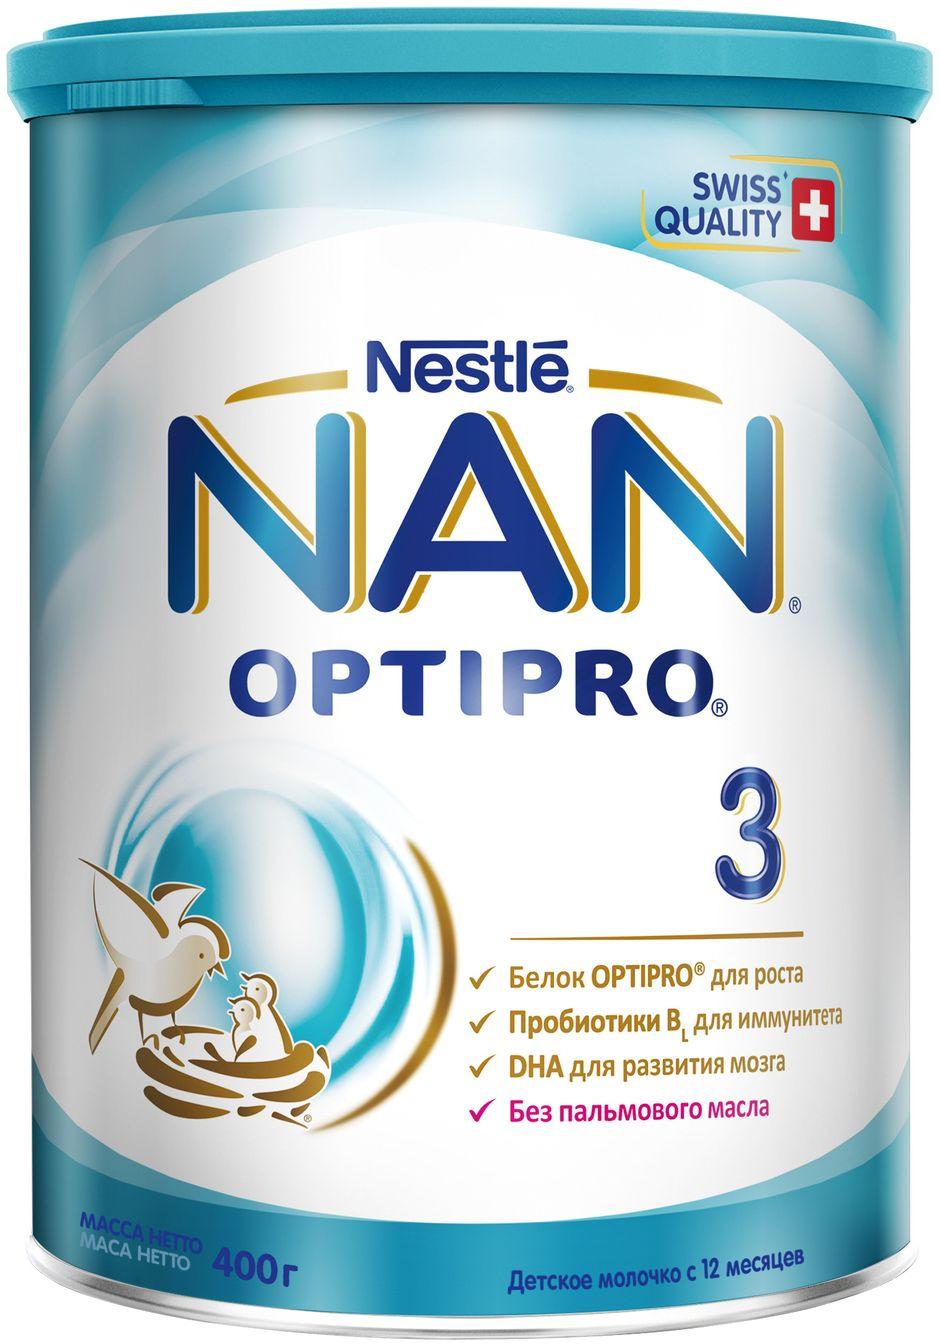 NAN 3 OPTIPRO молочко, с 12 месяцев, 400 г